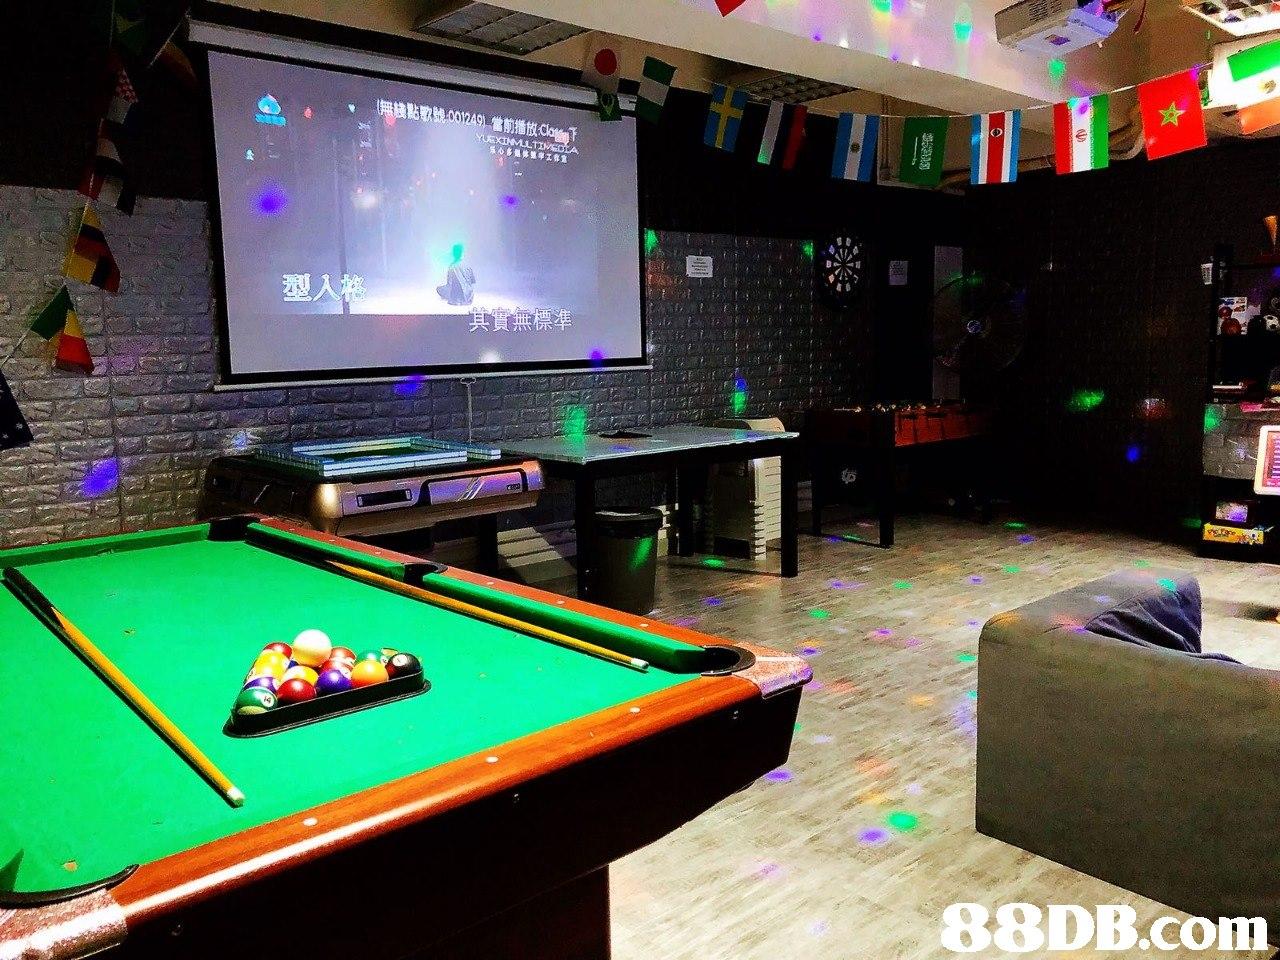 (D 型,billiard room,recreation room,games,billiard table,indoor games and sports